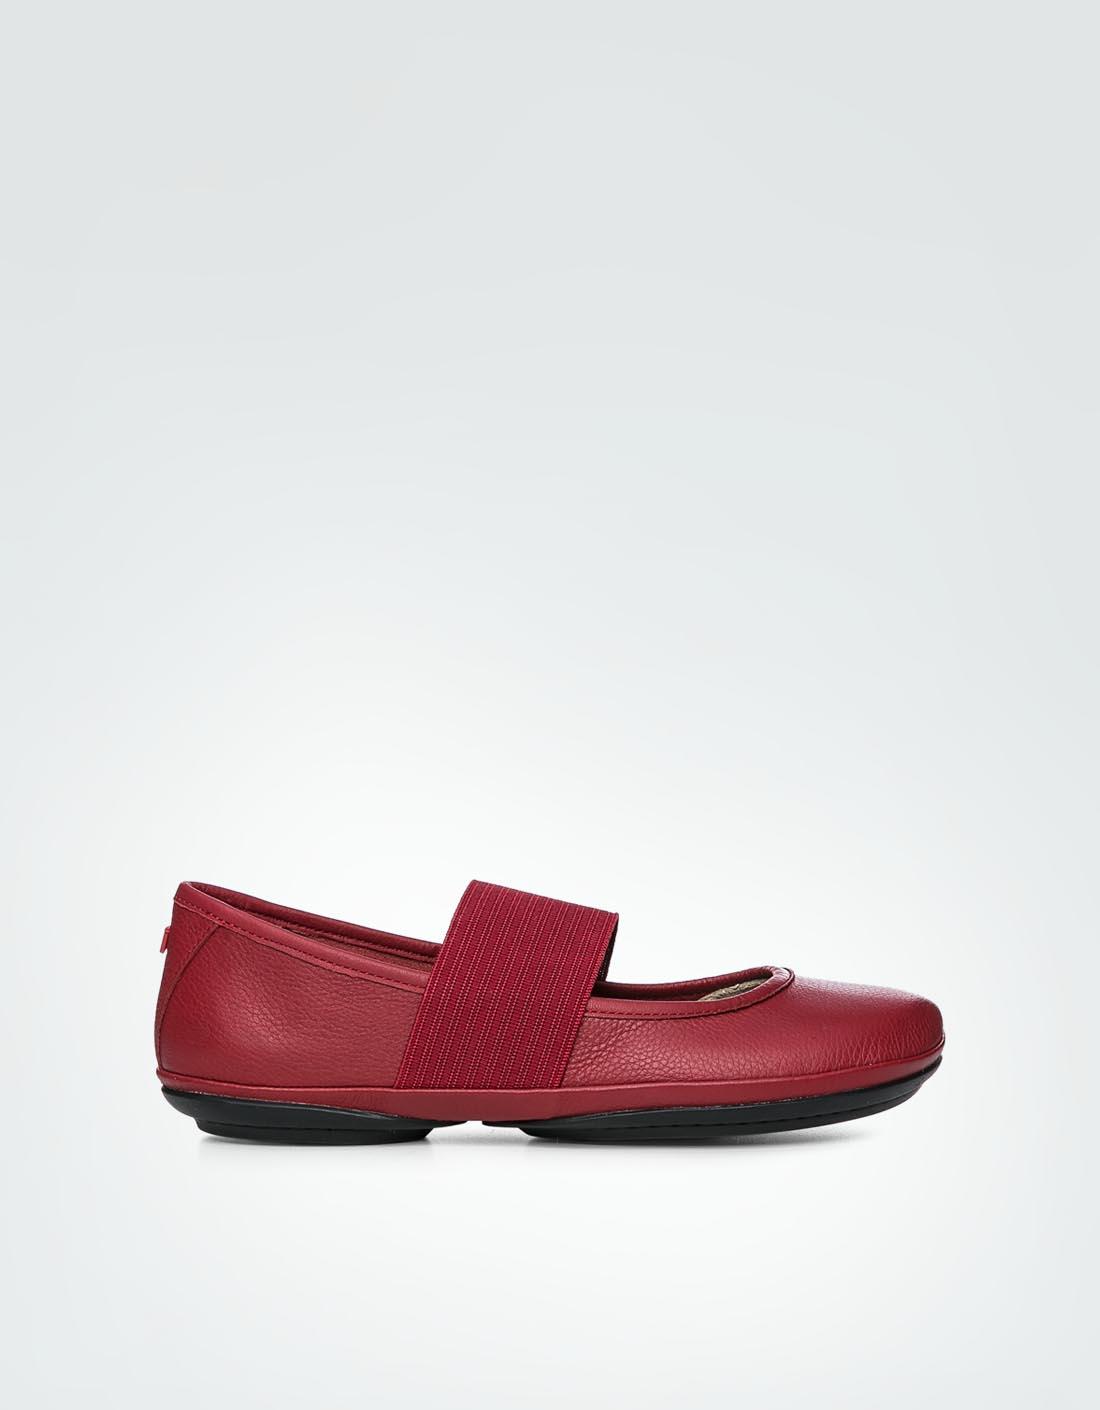 Camper Damen Schuhe Right Nina Rot Ballerinas Mit Komfortablem